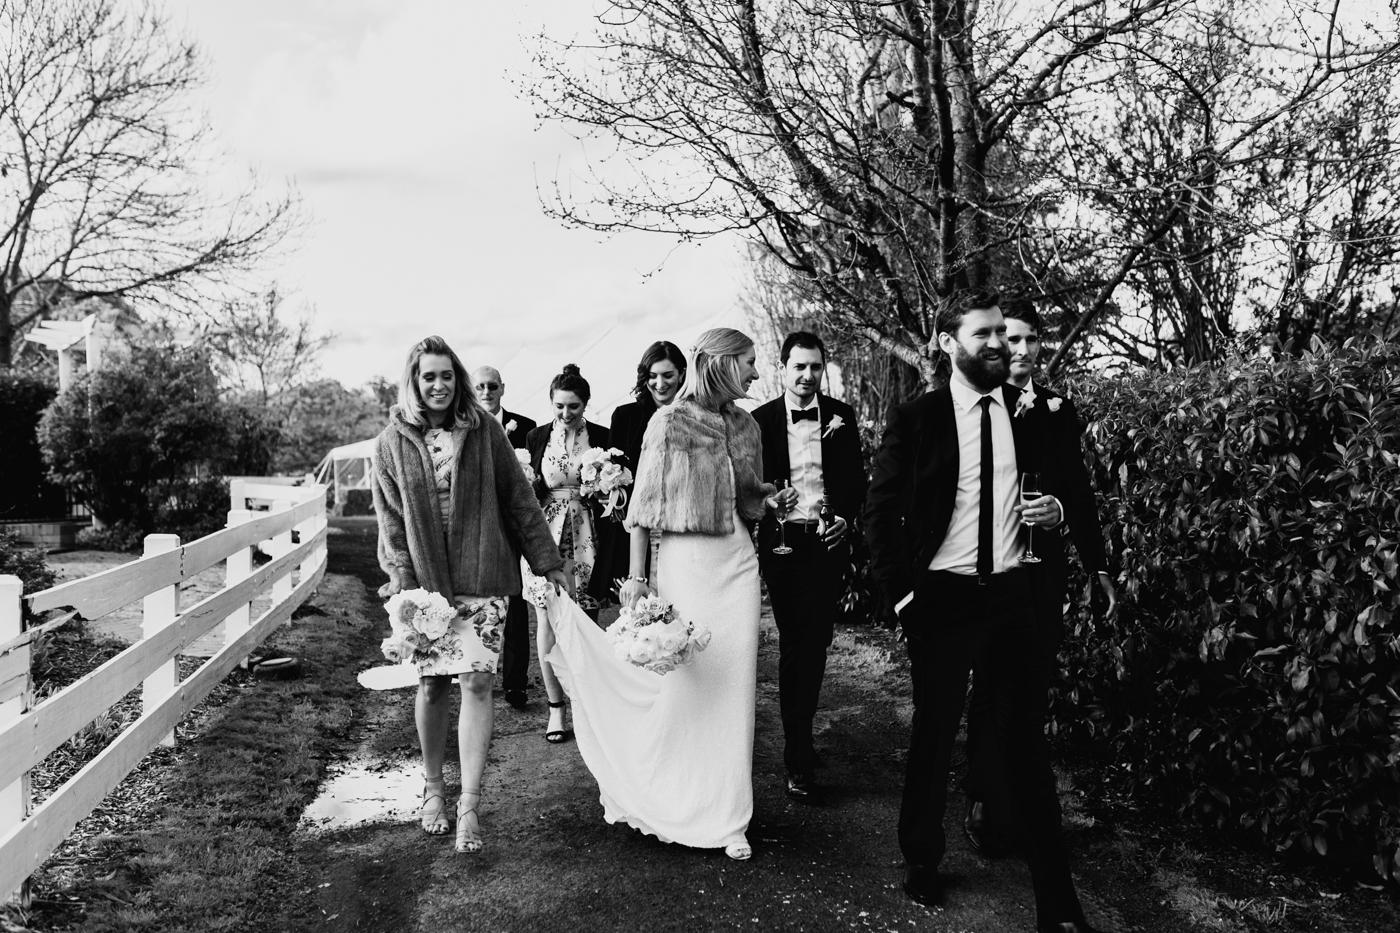 Bridget & James - Orange Country Wedding - Samantha Heather Photography-96.jpg